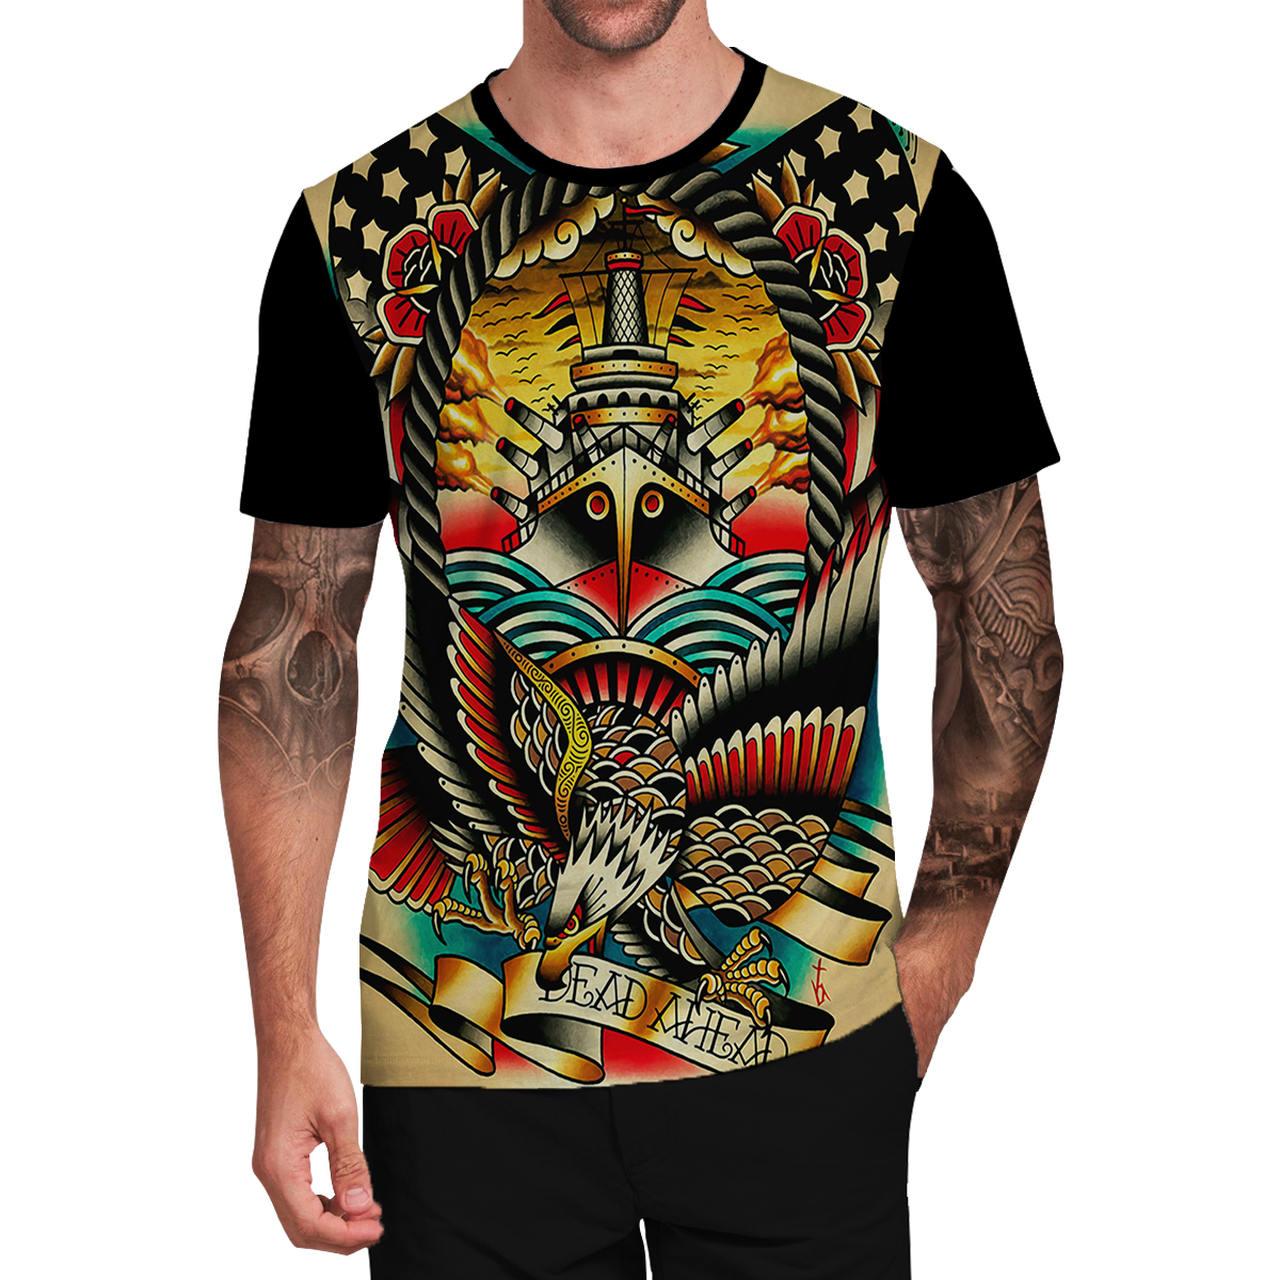 Stompy Camiseta Tattoo Tatuagem Caveira Skull 74